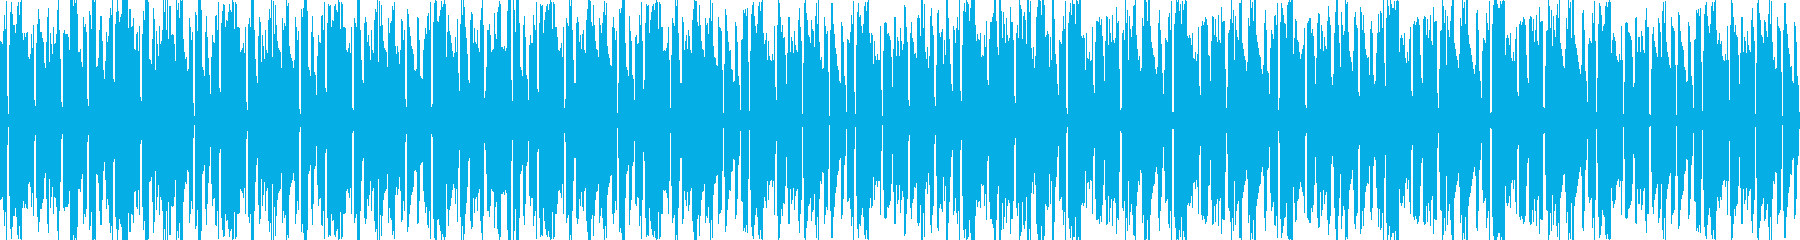 Bossa Nova style / healing guitar background's reproduced waveform